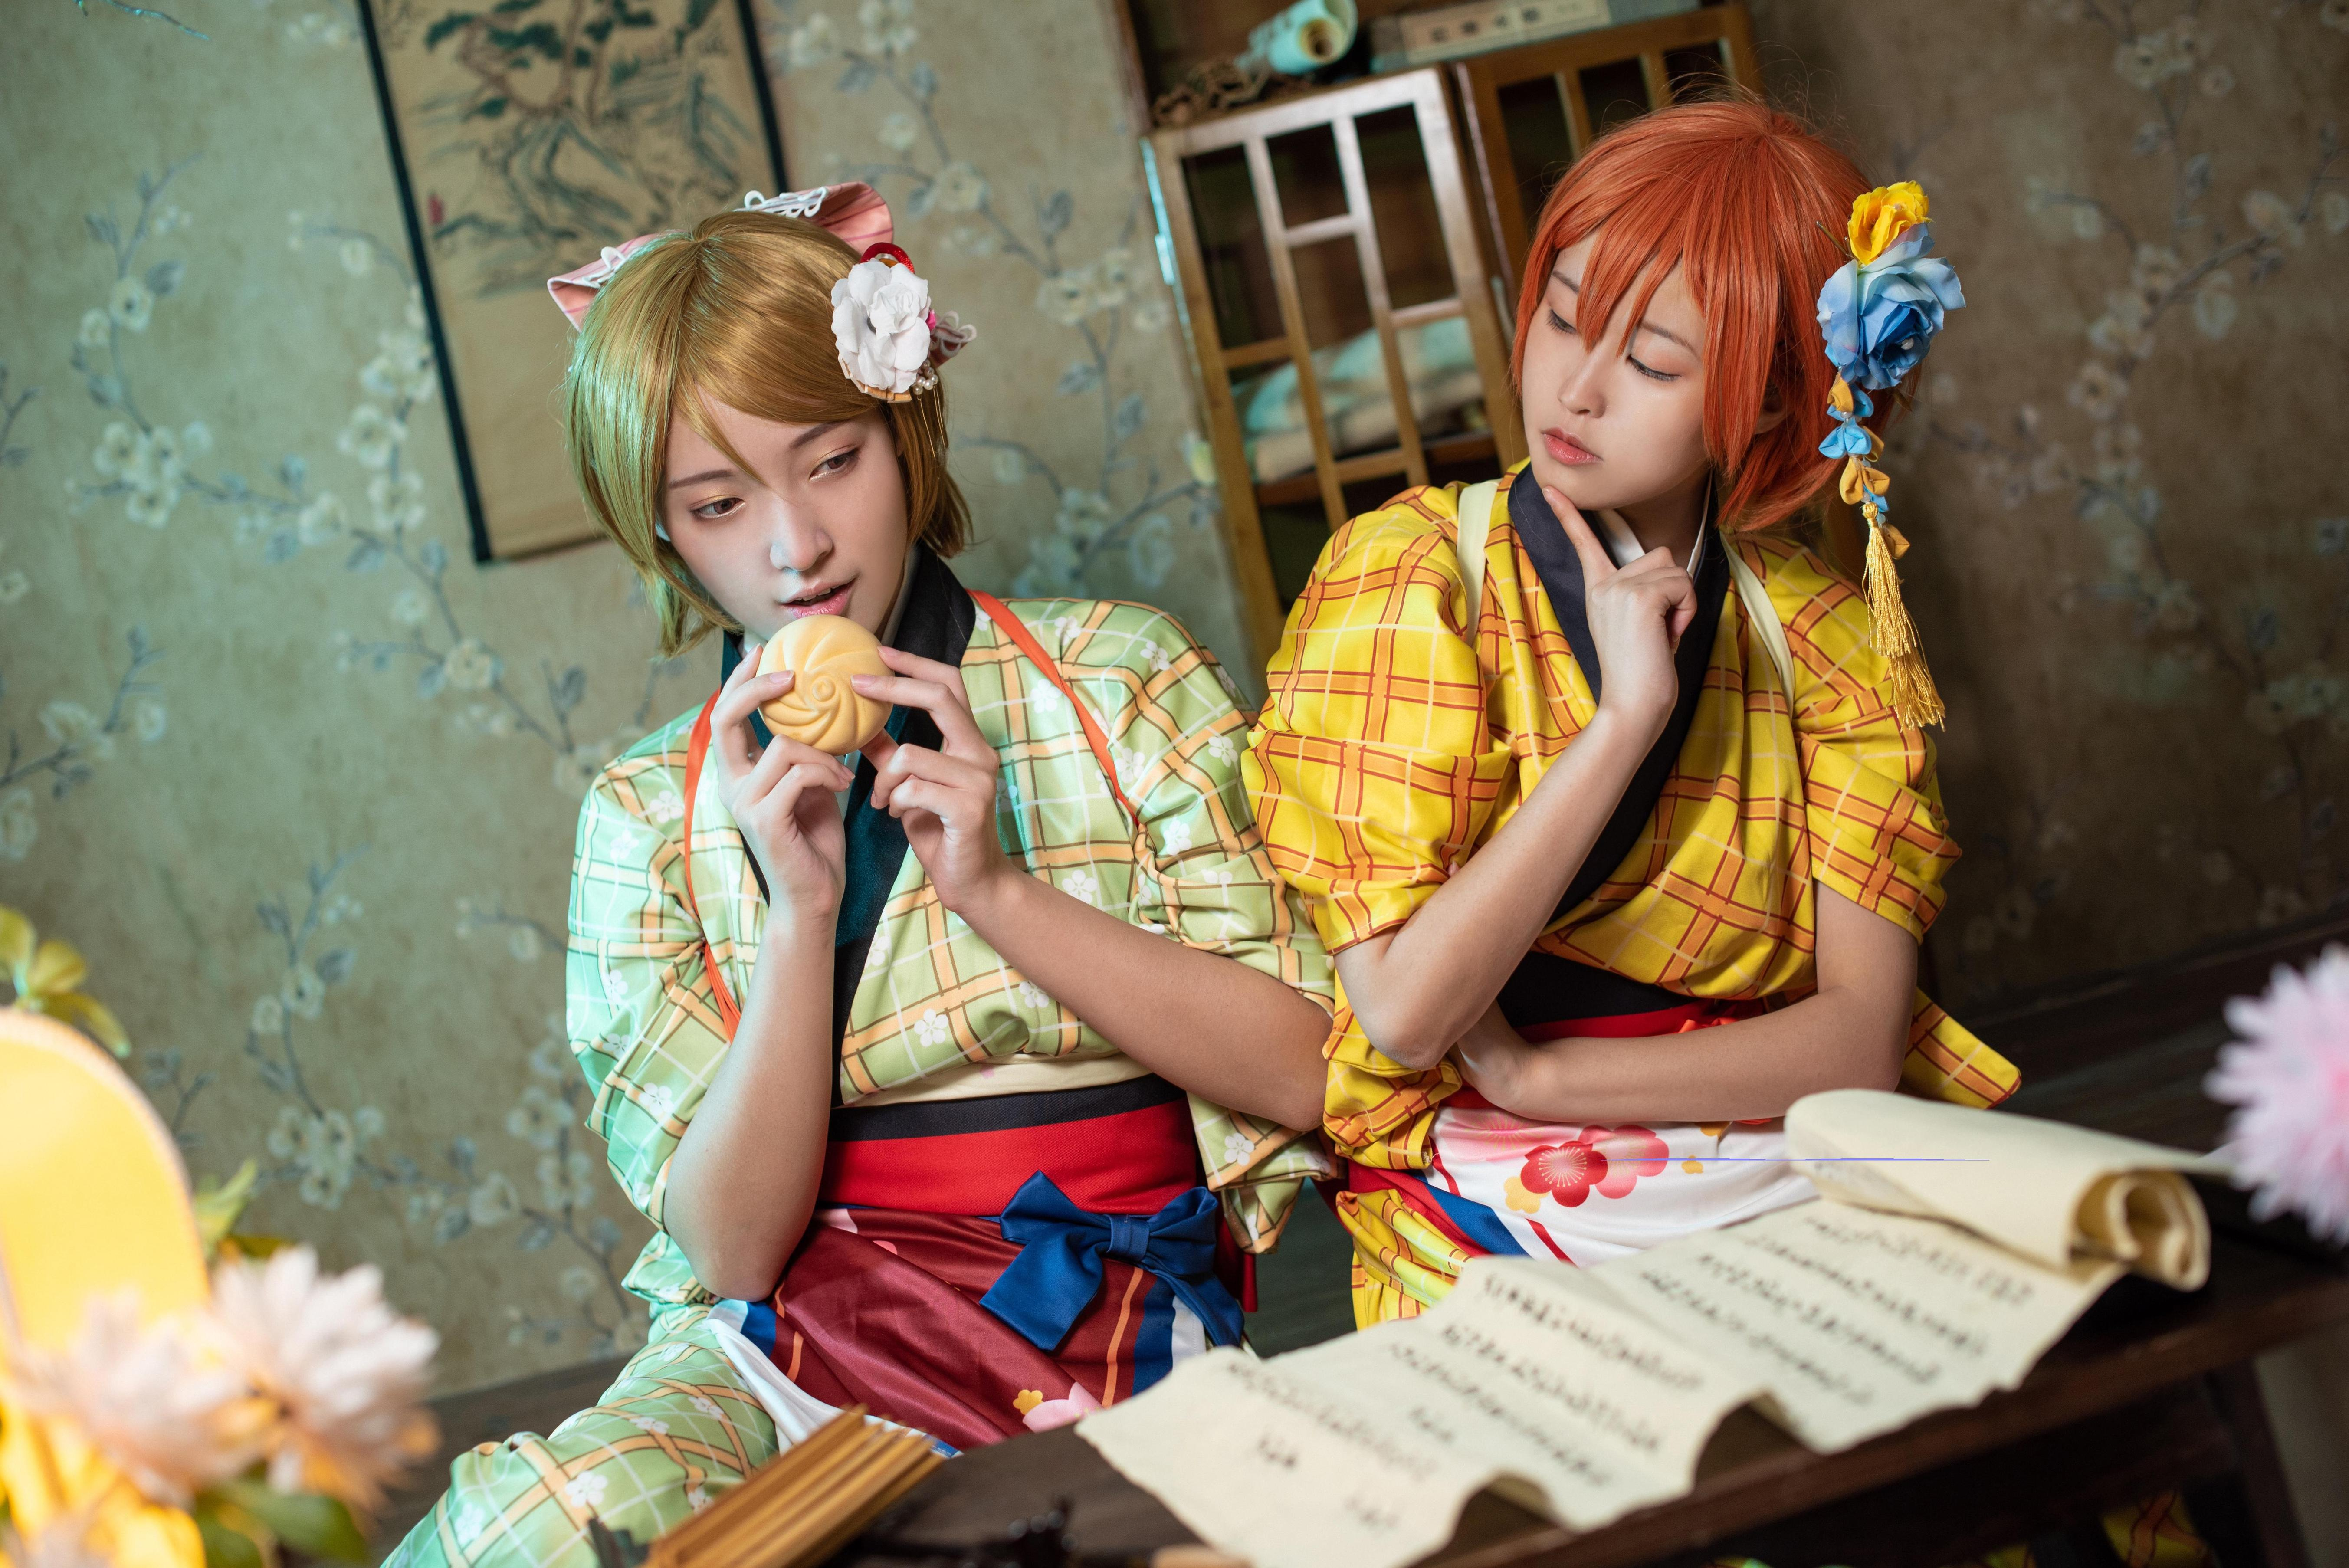 《LOVE LIVE!》正片cosplay【CN:辰苏】-第4张